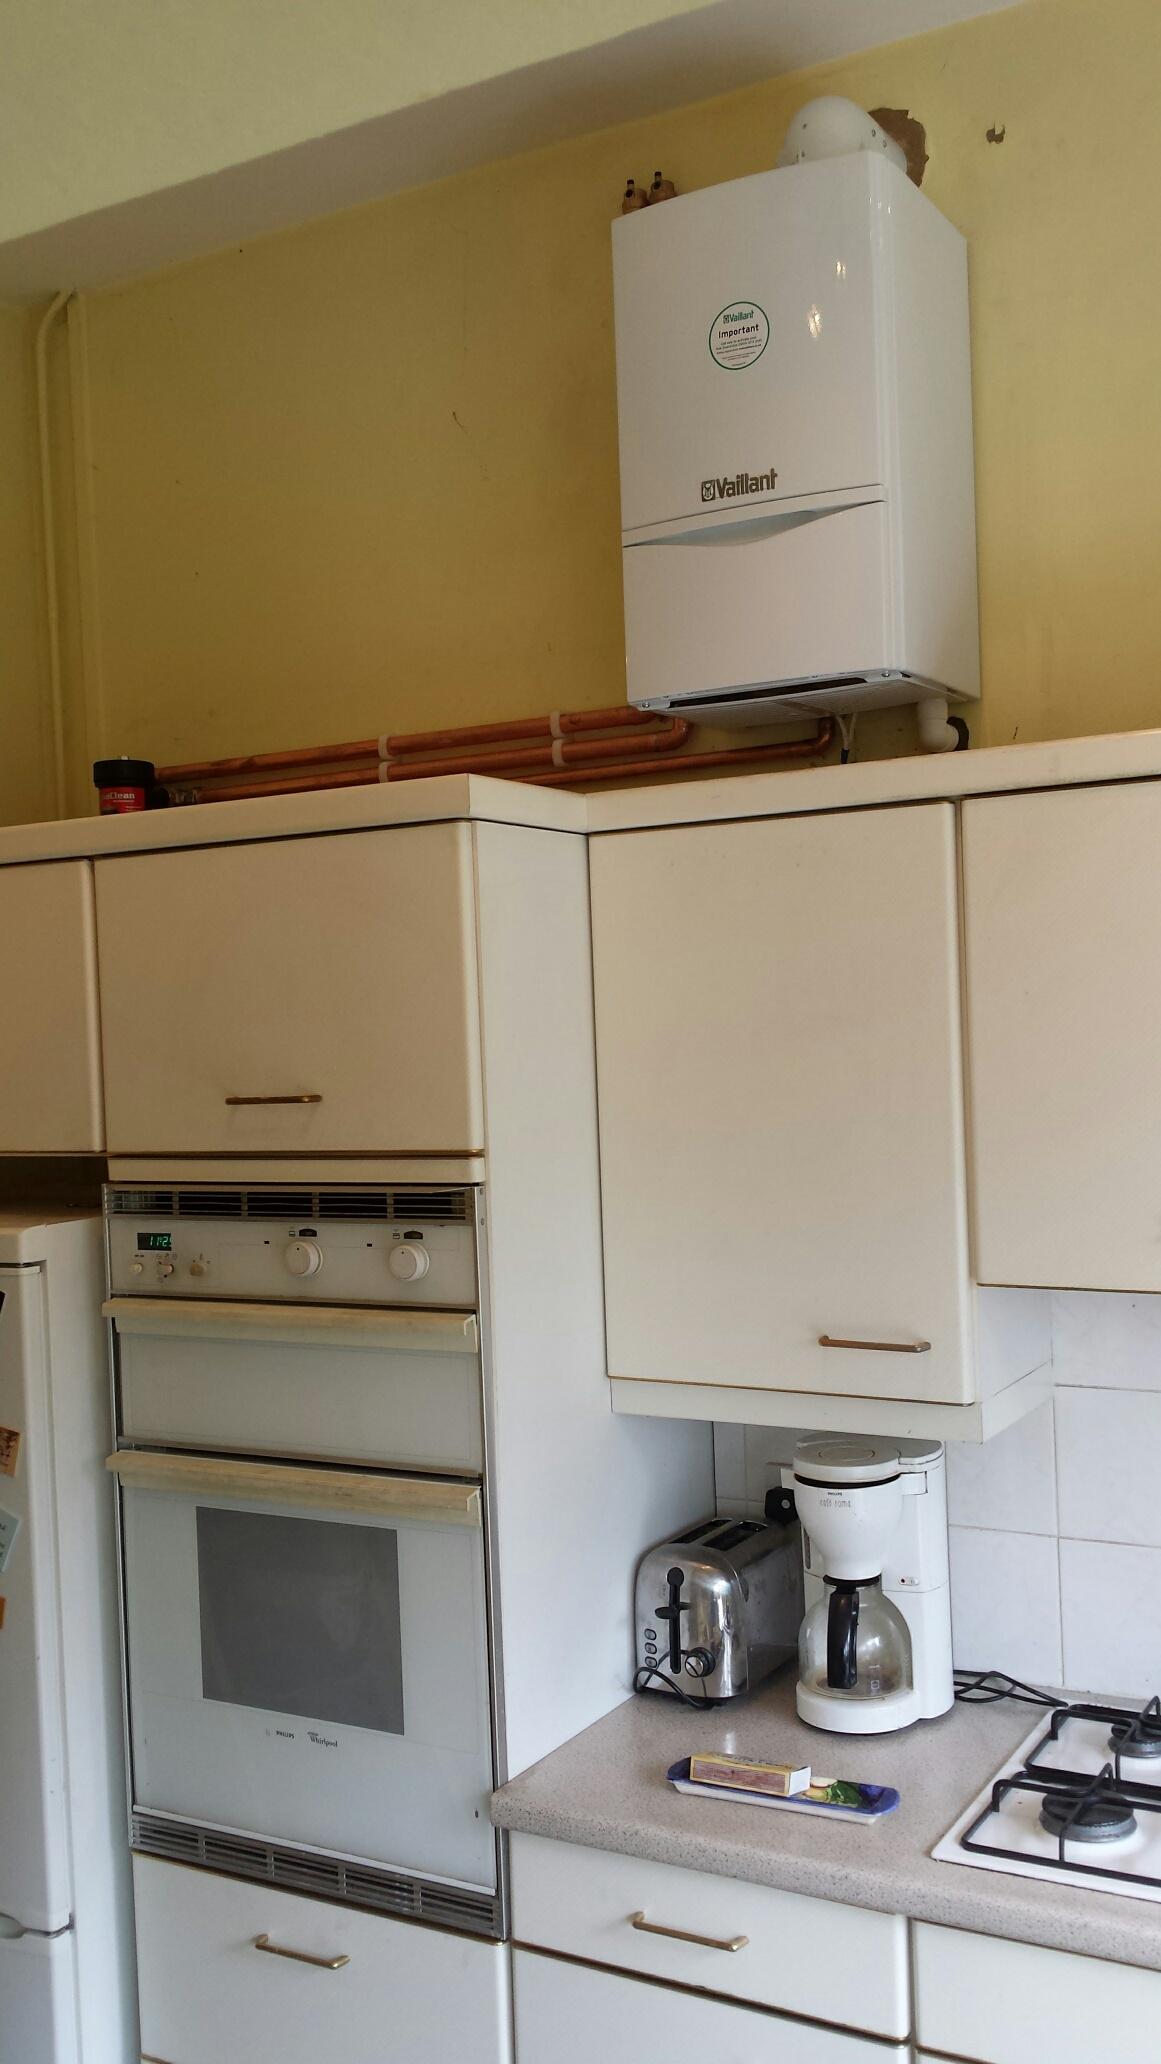 vaillant ecotec plus 438 open vent boiler installation kingston heating and. Black Bedroom Furniture Sets. Home Design Ideas